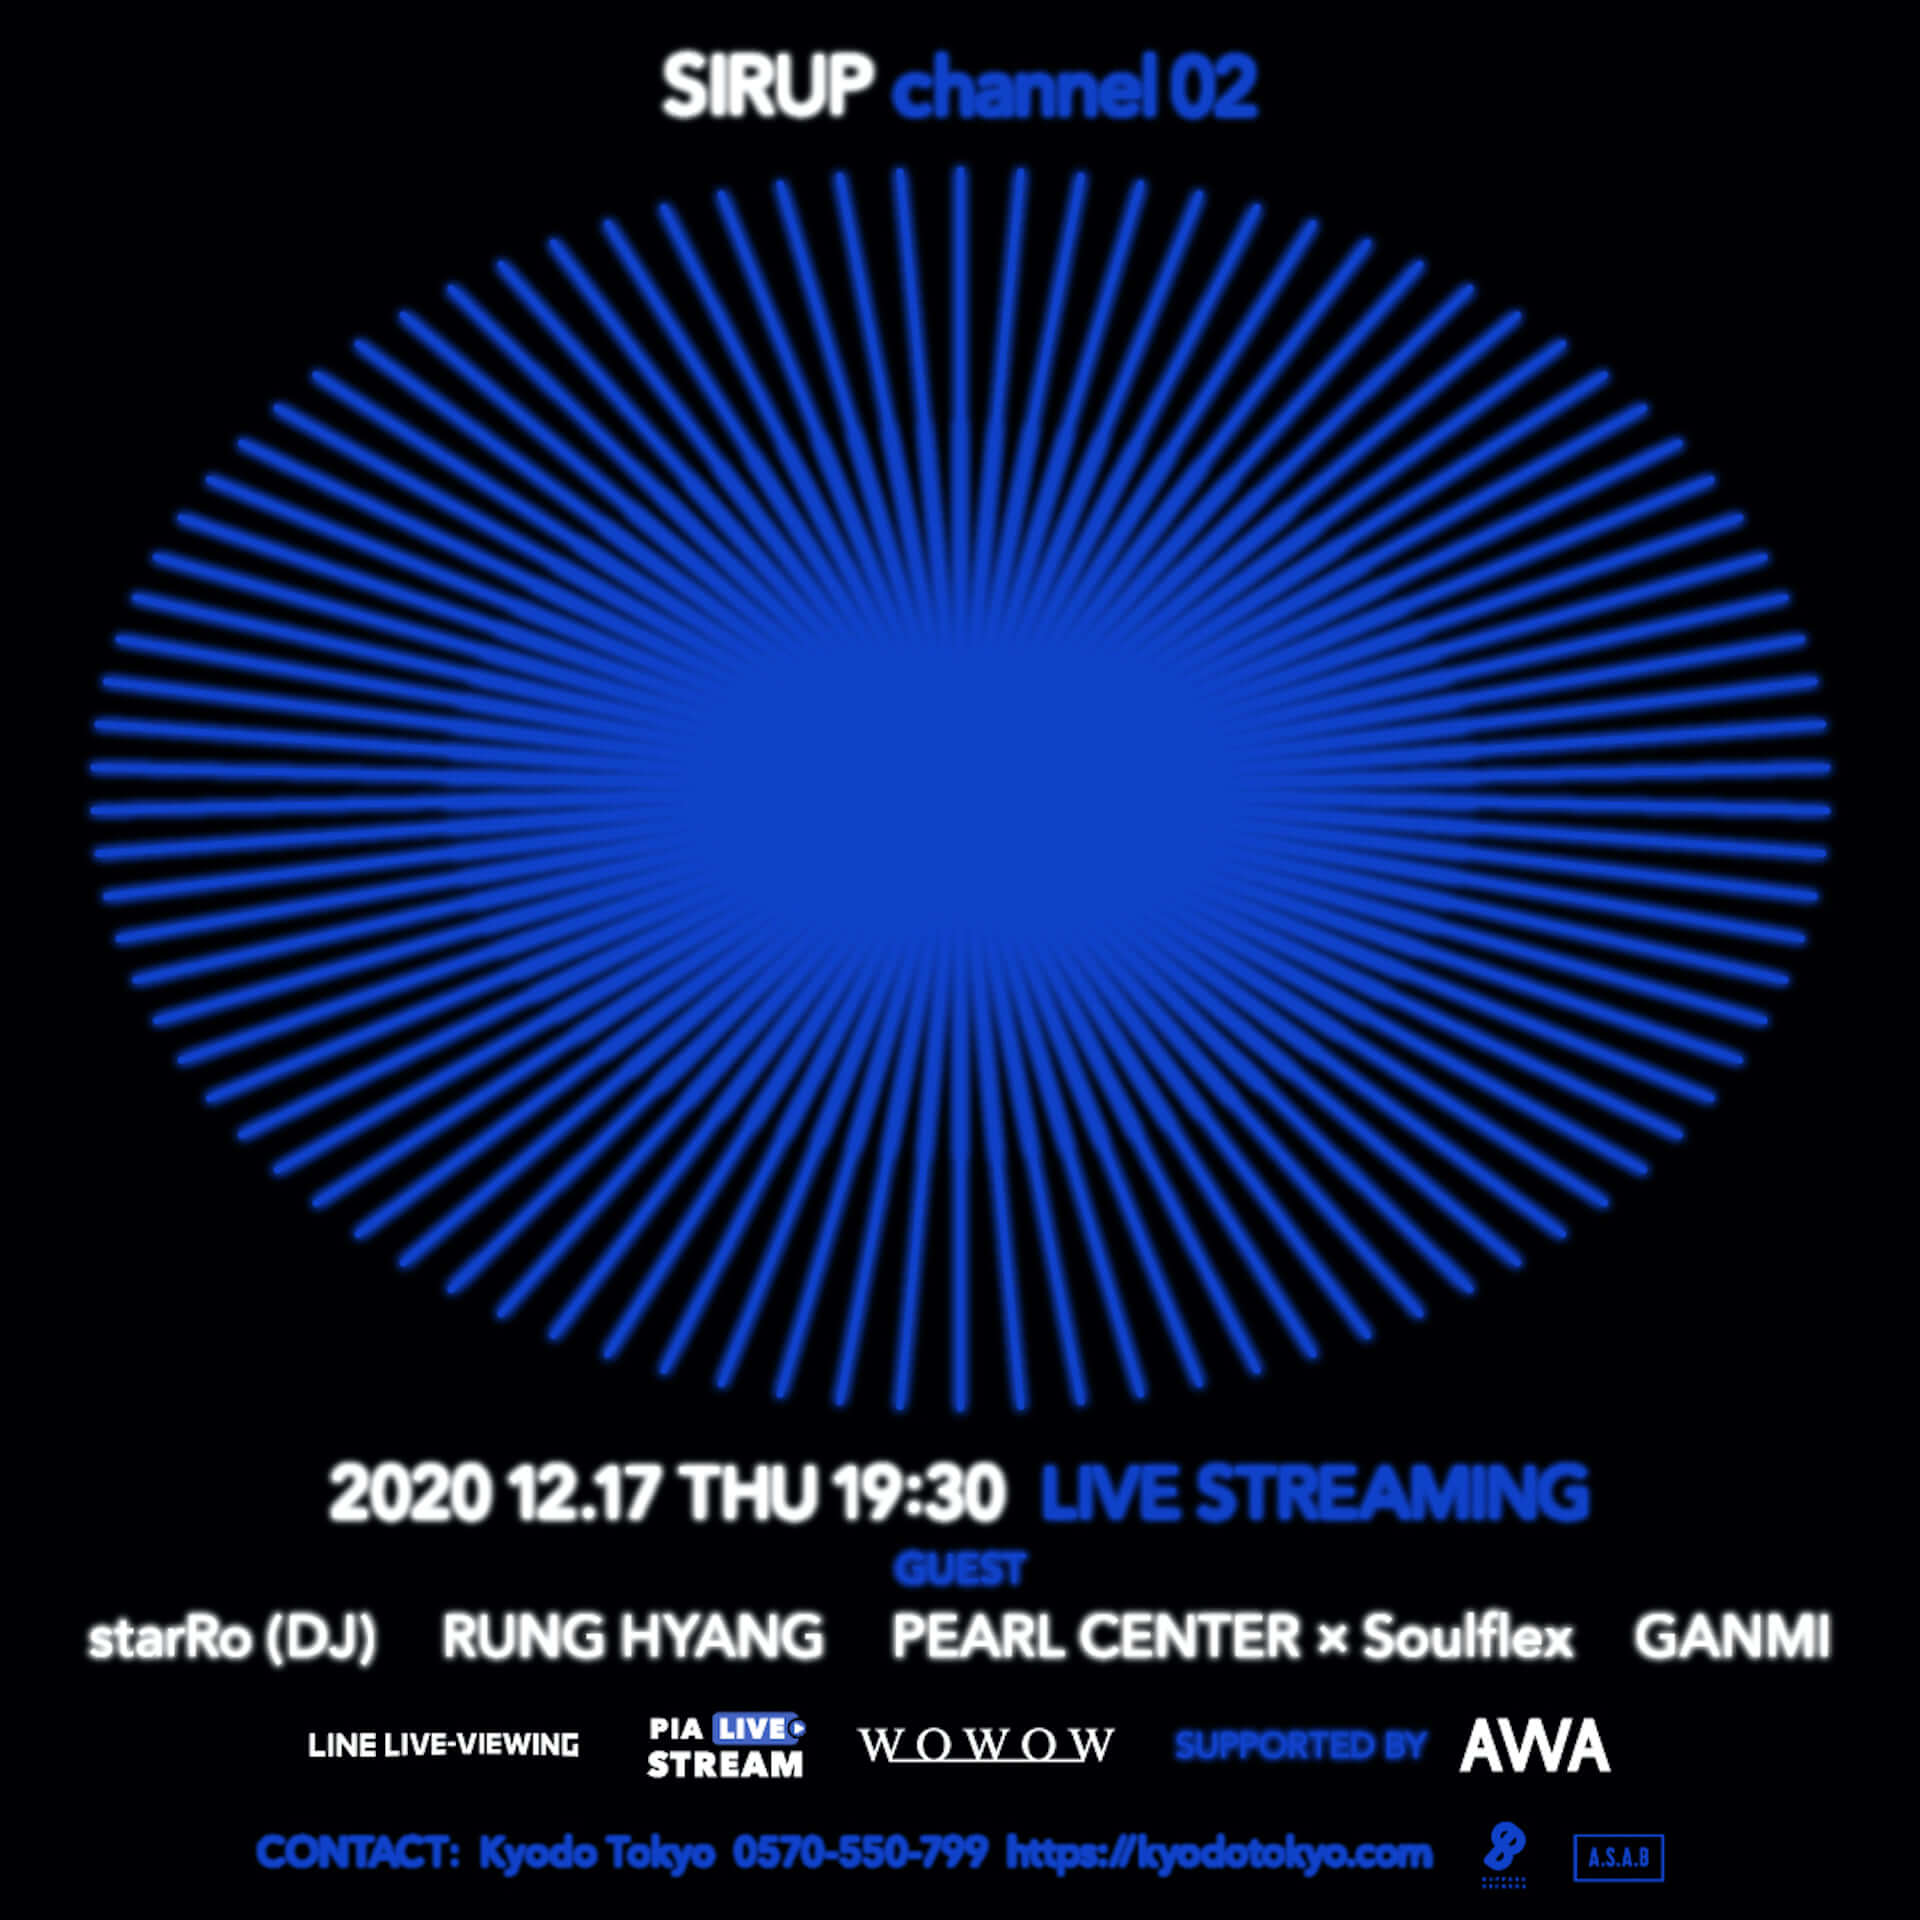 SIRUPの生配信ライブ<channel 02>にstarRo、Soulflex、PEARL CENTERらが出演決定!会場招待企画も実施中 music201208_sirup_2-1920x1920